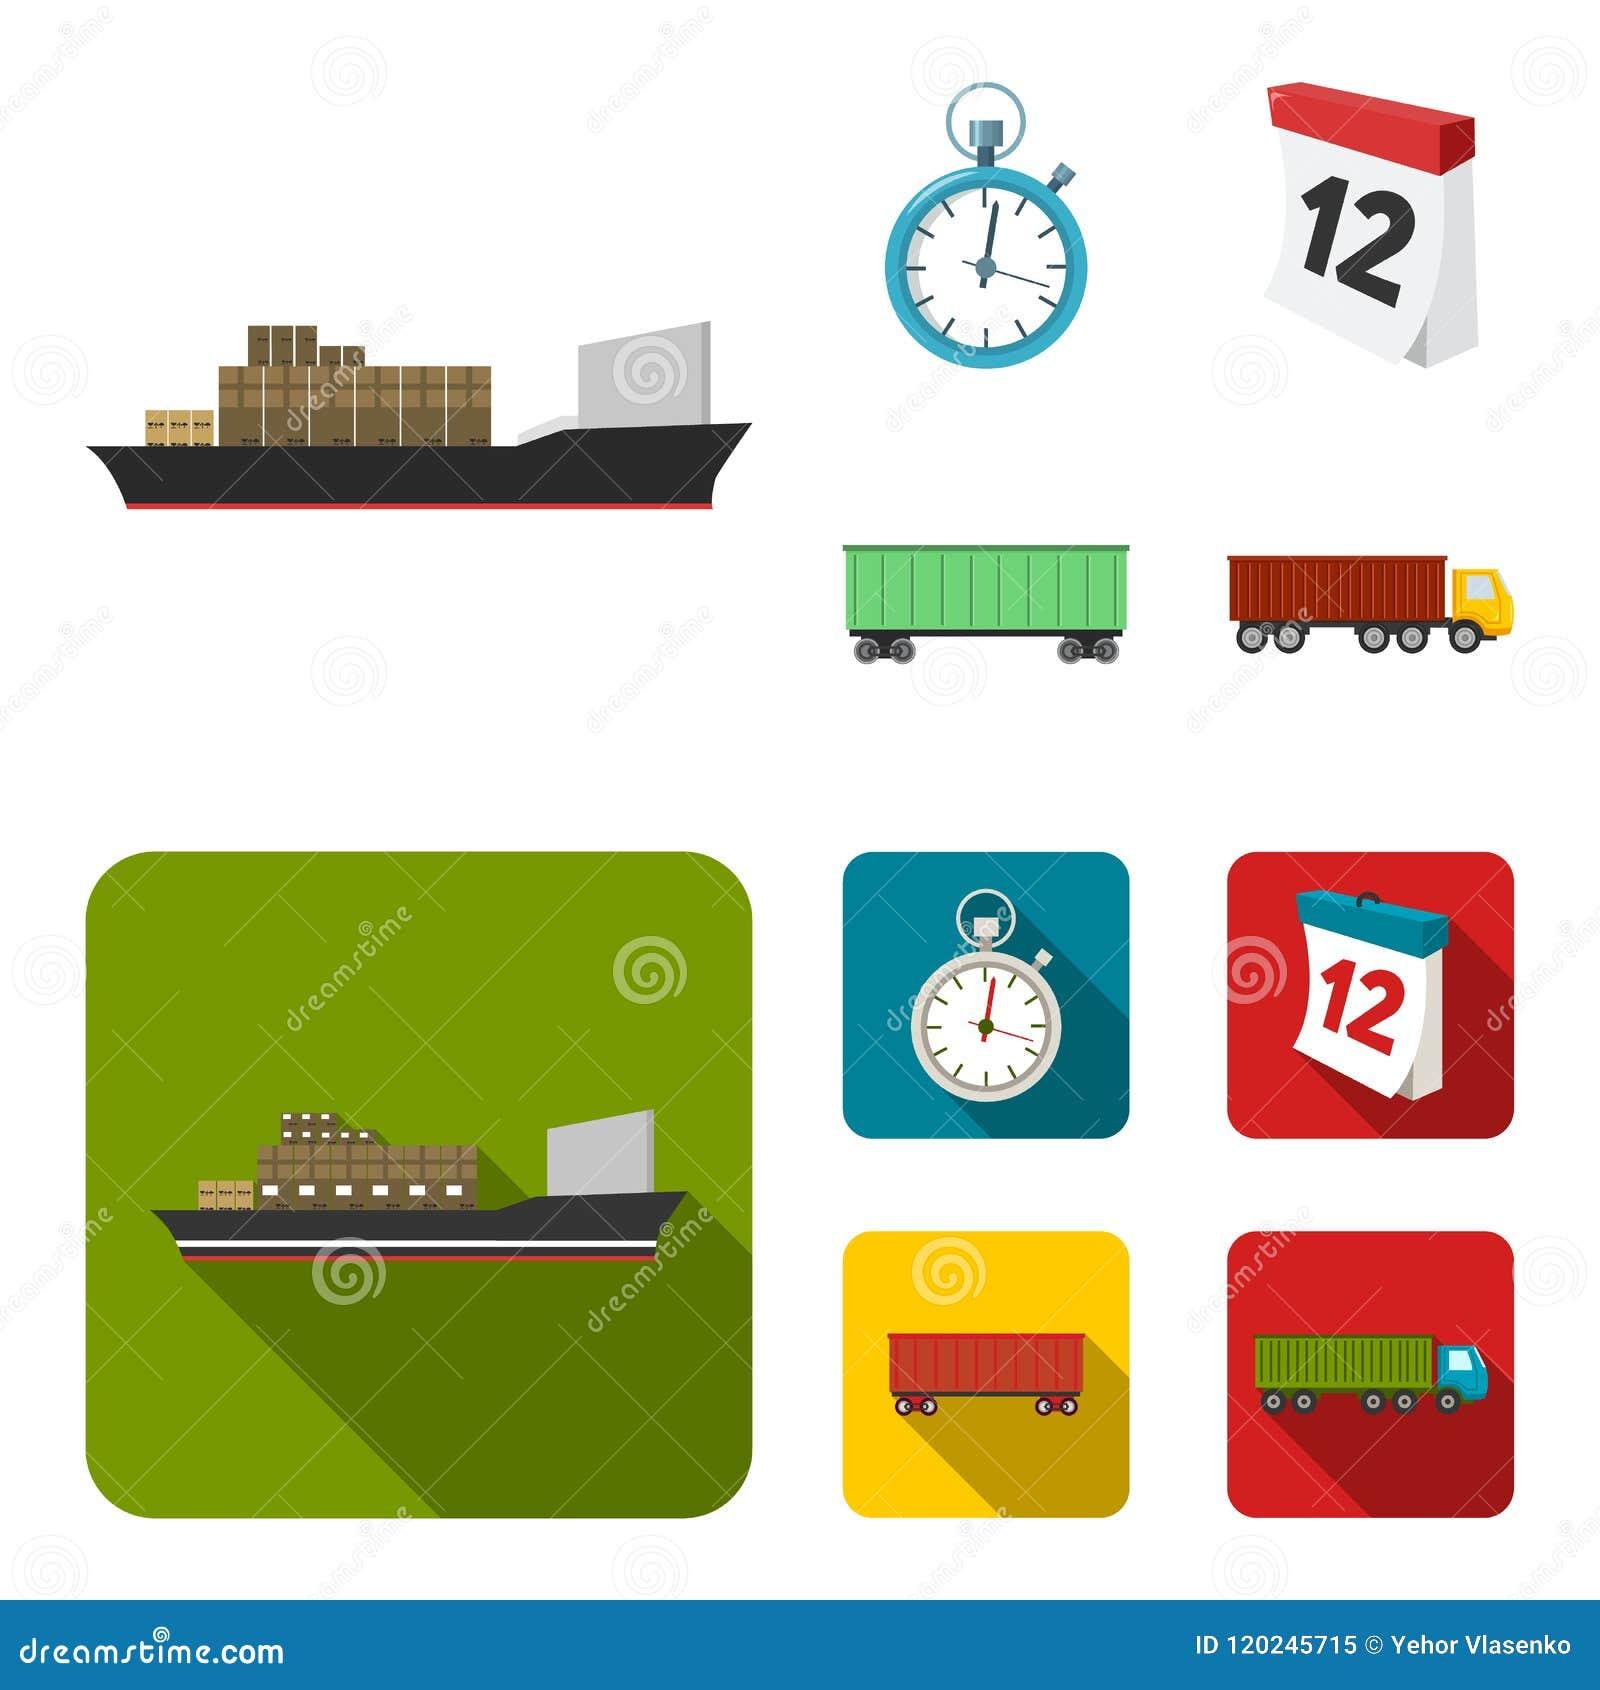 Cargo ship, stop watch, calendar, railway car.Logistic,set collection icons in cartoon,flat style vector symbol stock